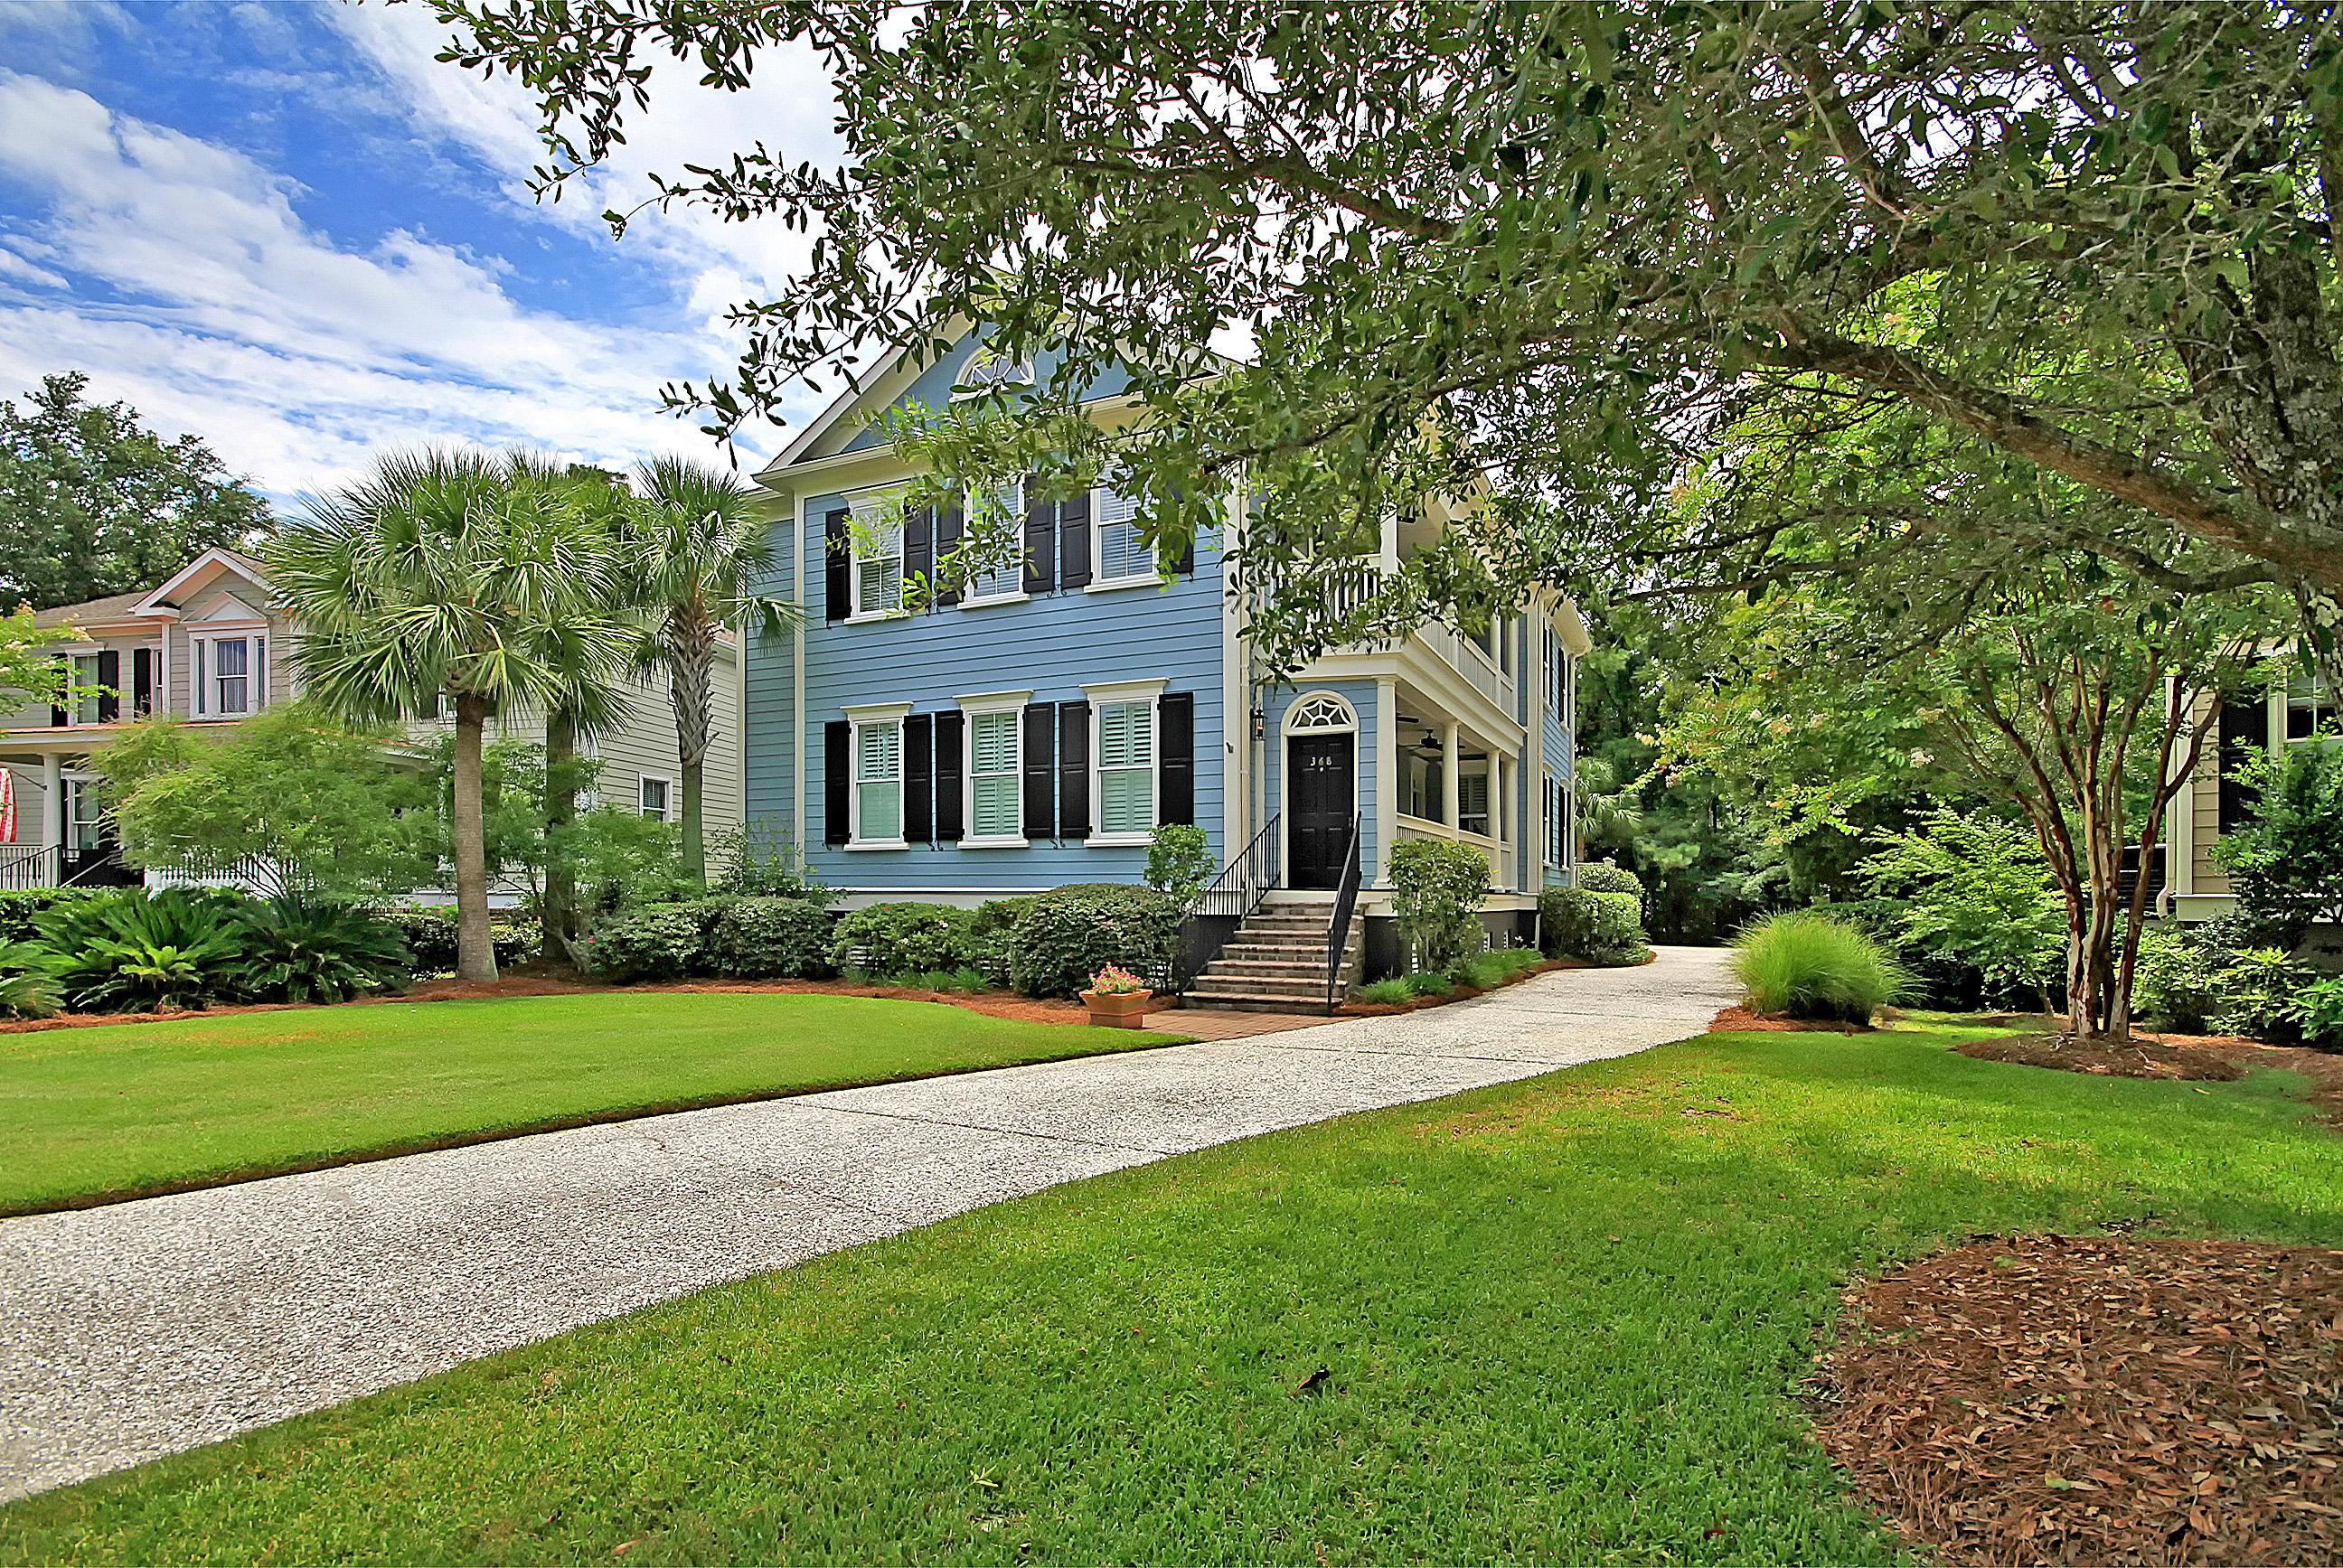 Belle Hall Homes For Sale - 368 Evian, Mount Pleasant, SC - 54